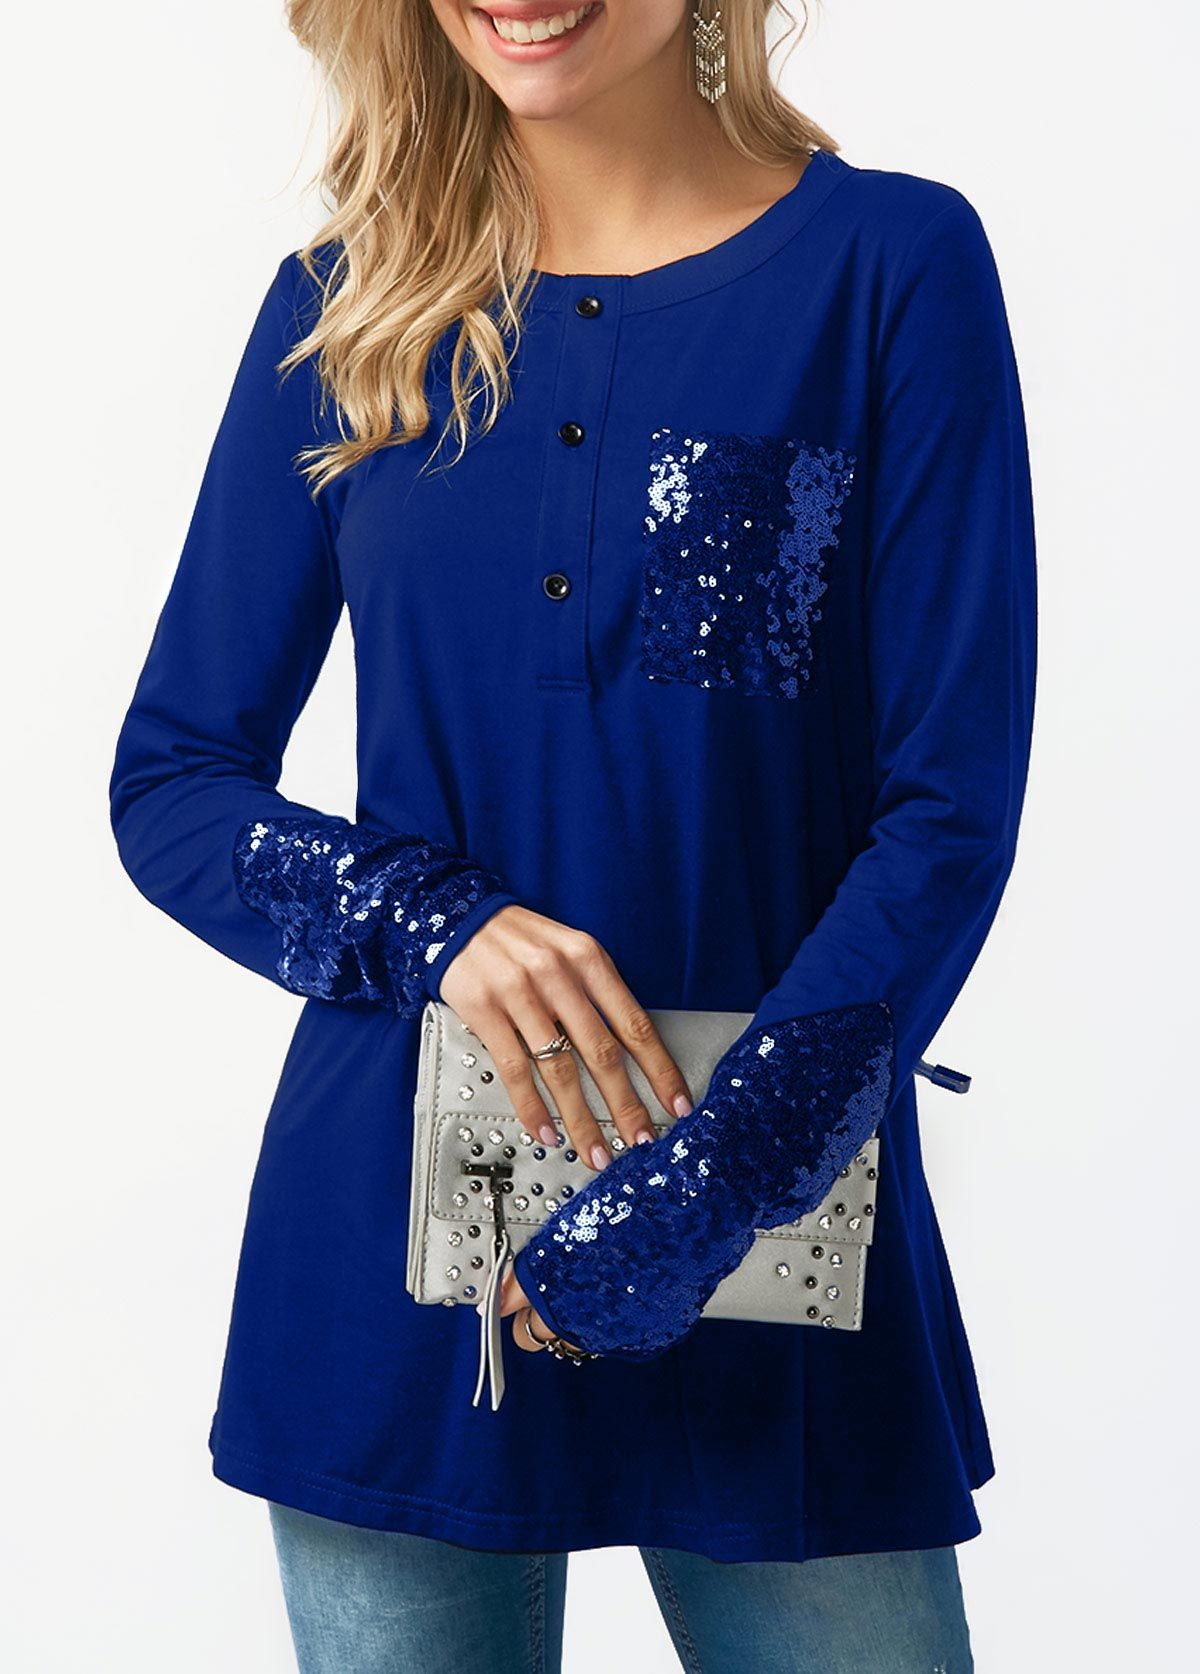 b64aa42f739 Button Neck Long Sleeve Royal Blue T Shirt